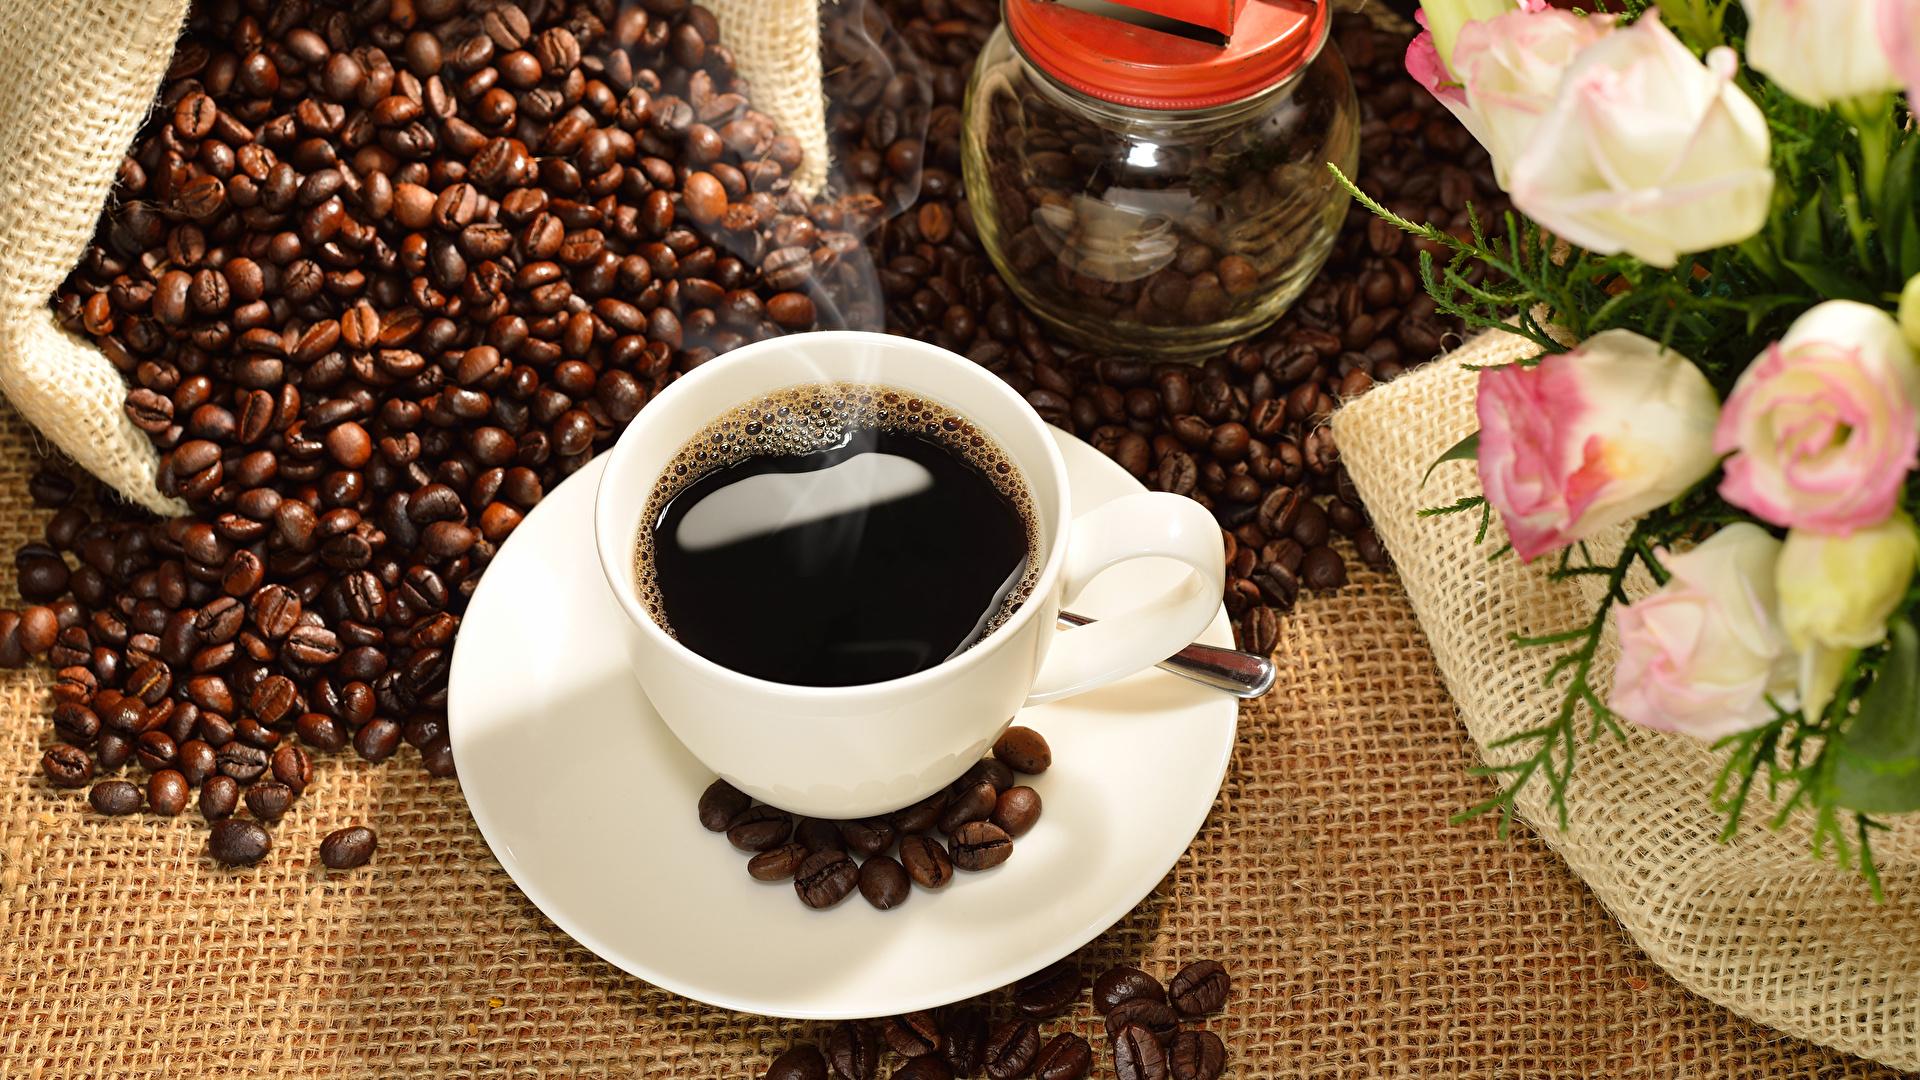 Bilder Kaffee Getreide Tasse Lebensmittel 1920x1080